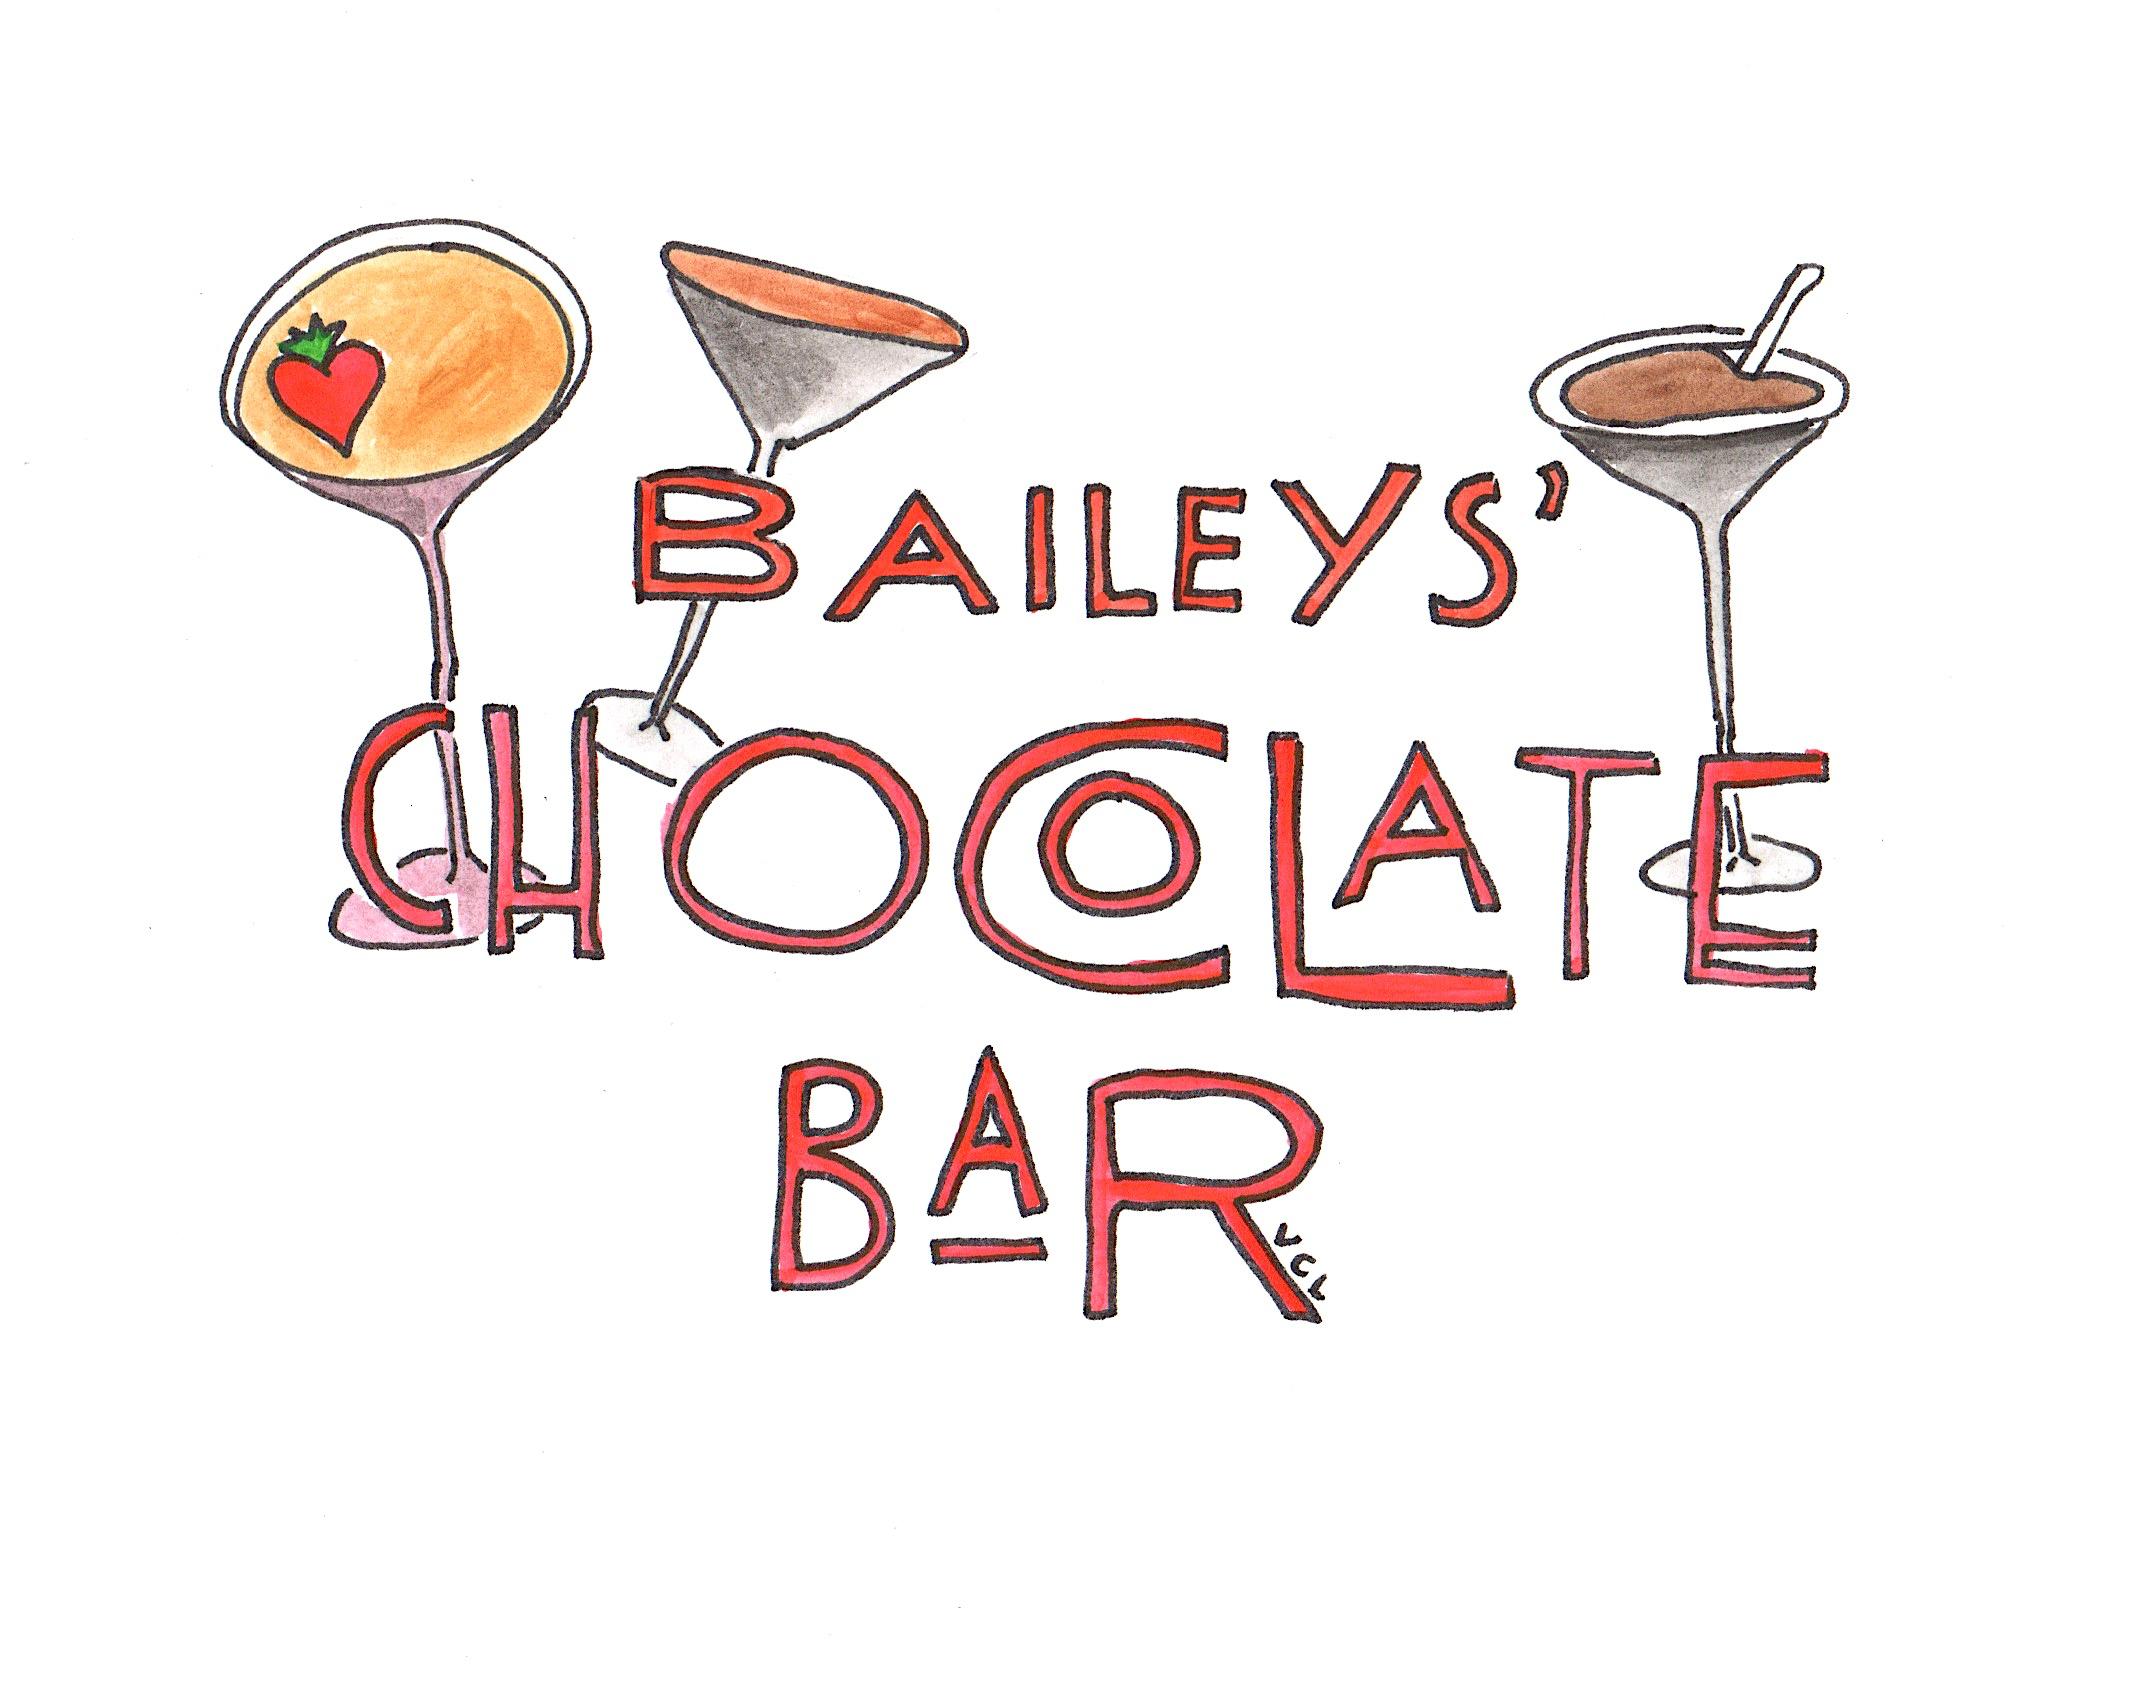 Bailey's Chocolate Bar